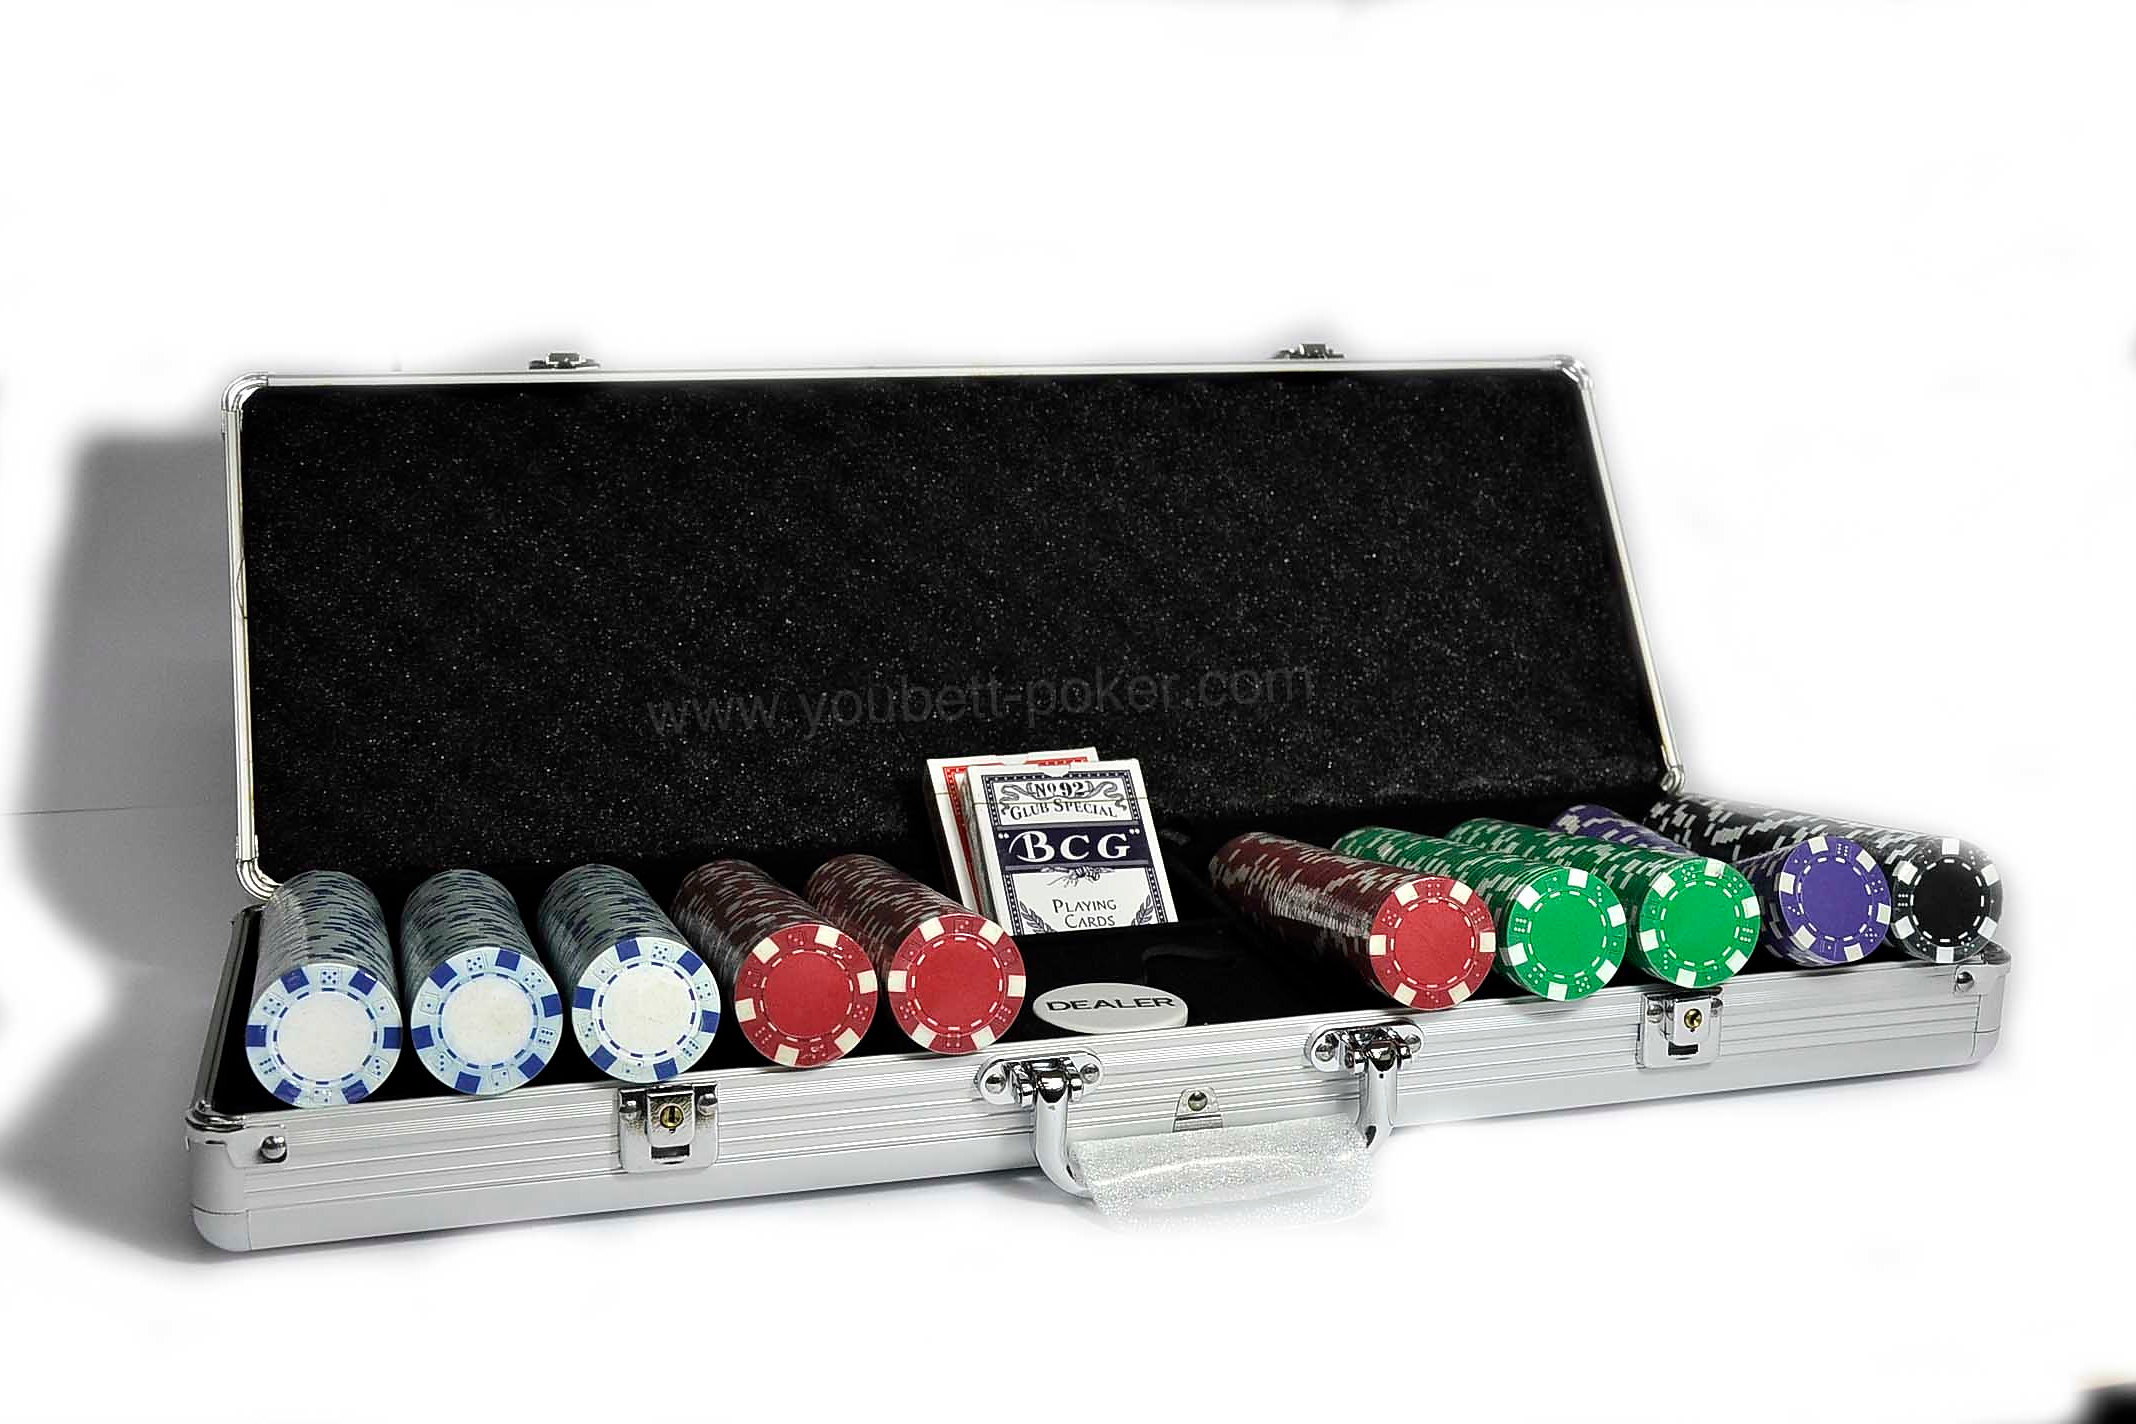 500 strip dice poker chip set - Poker Chips Set